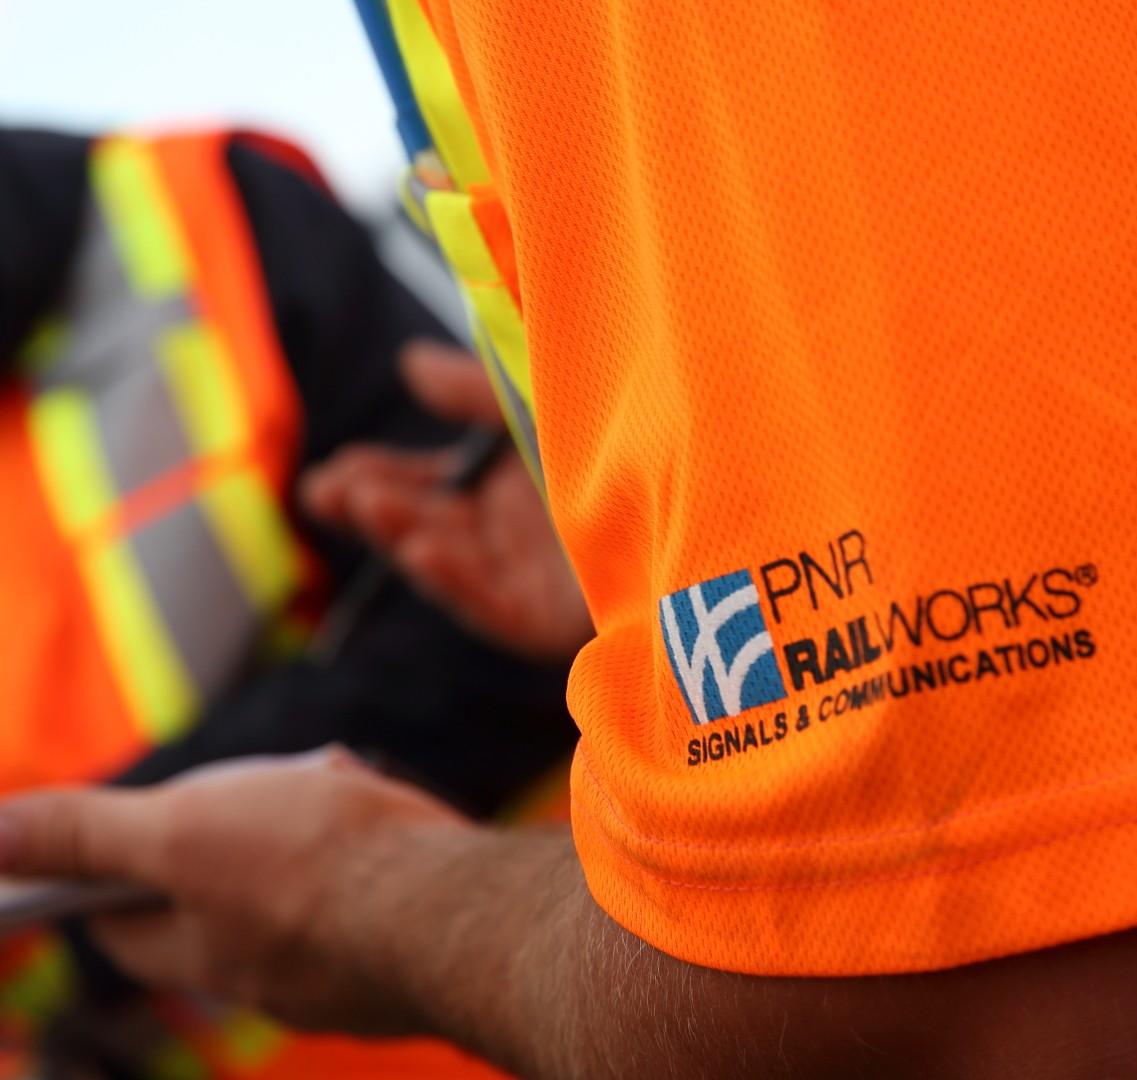 PNR RailWorks | LinkedIn